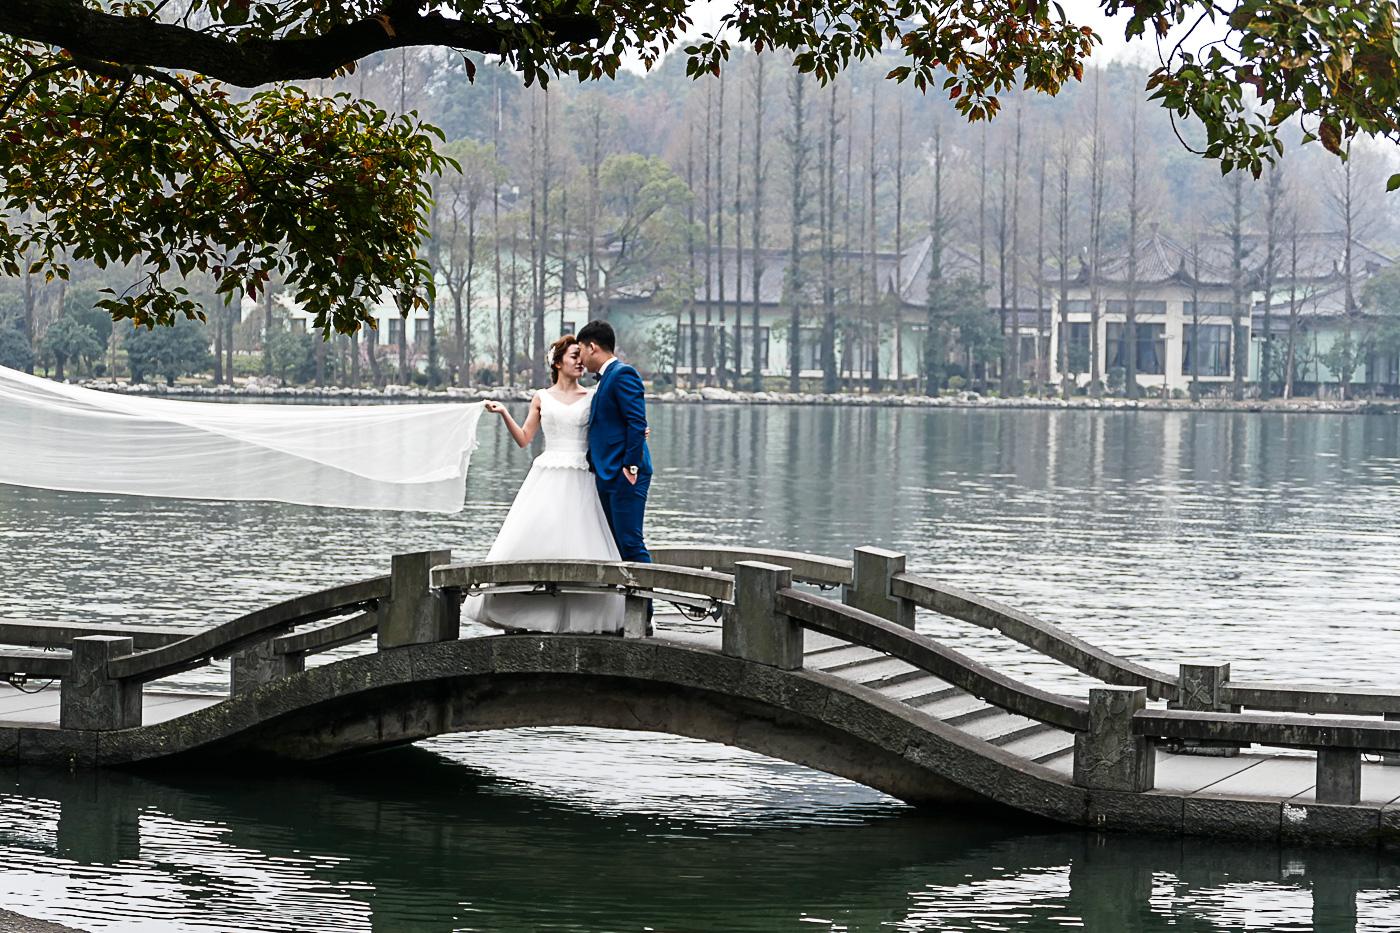 Hangzhou is a favorite spot for wedding photos